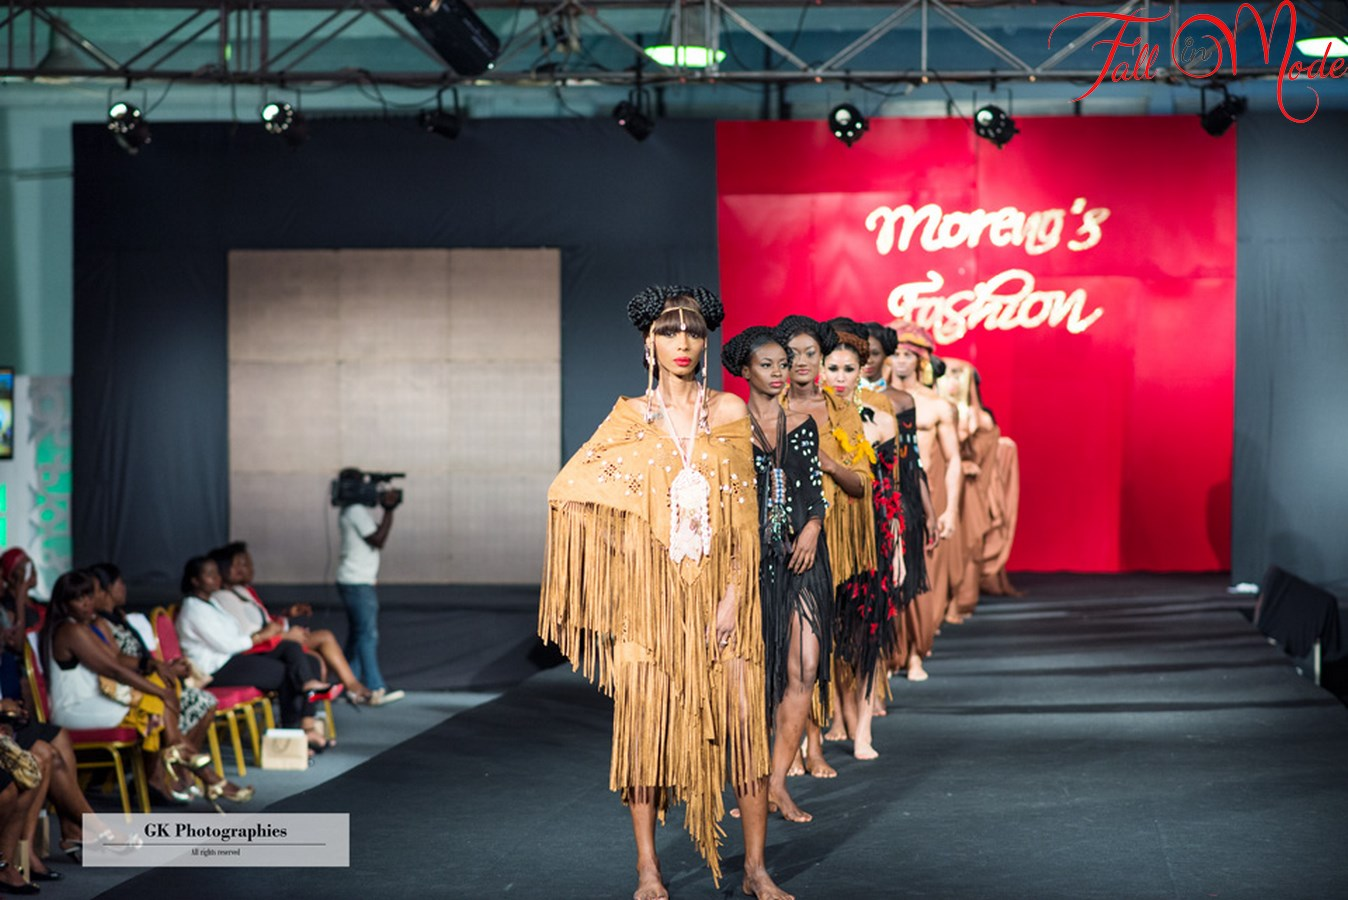 moreno's fashion_mickael_kra